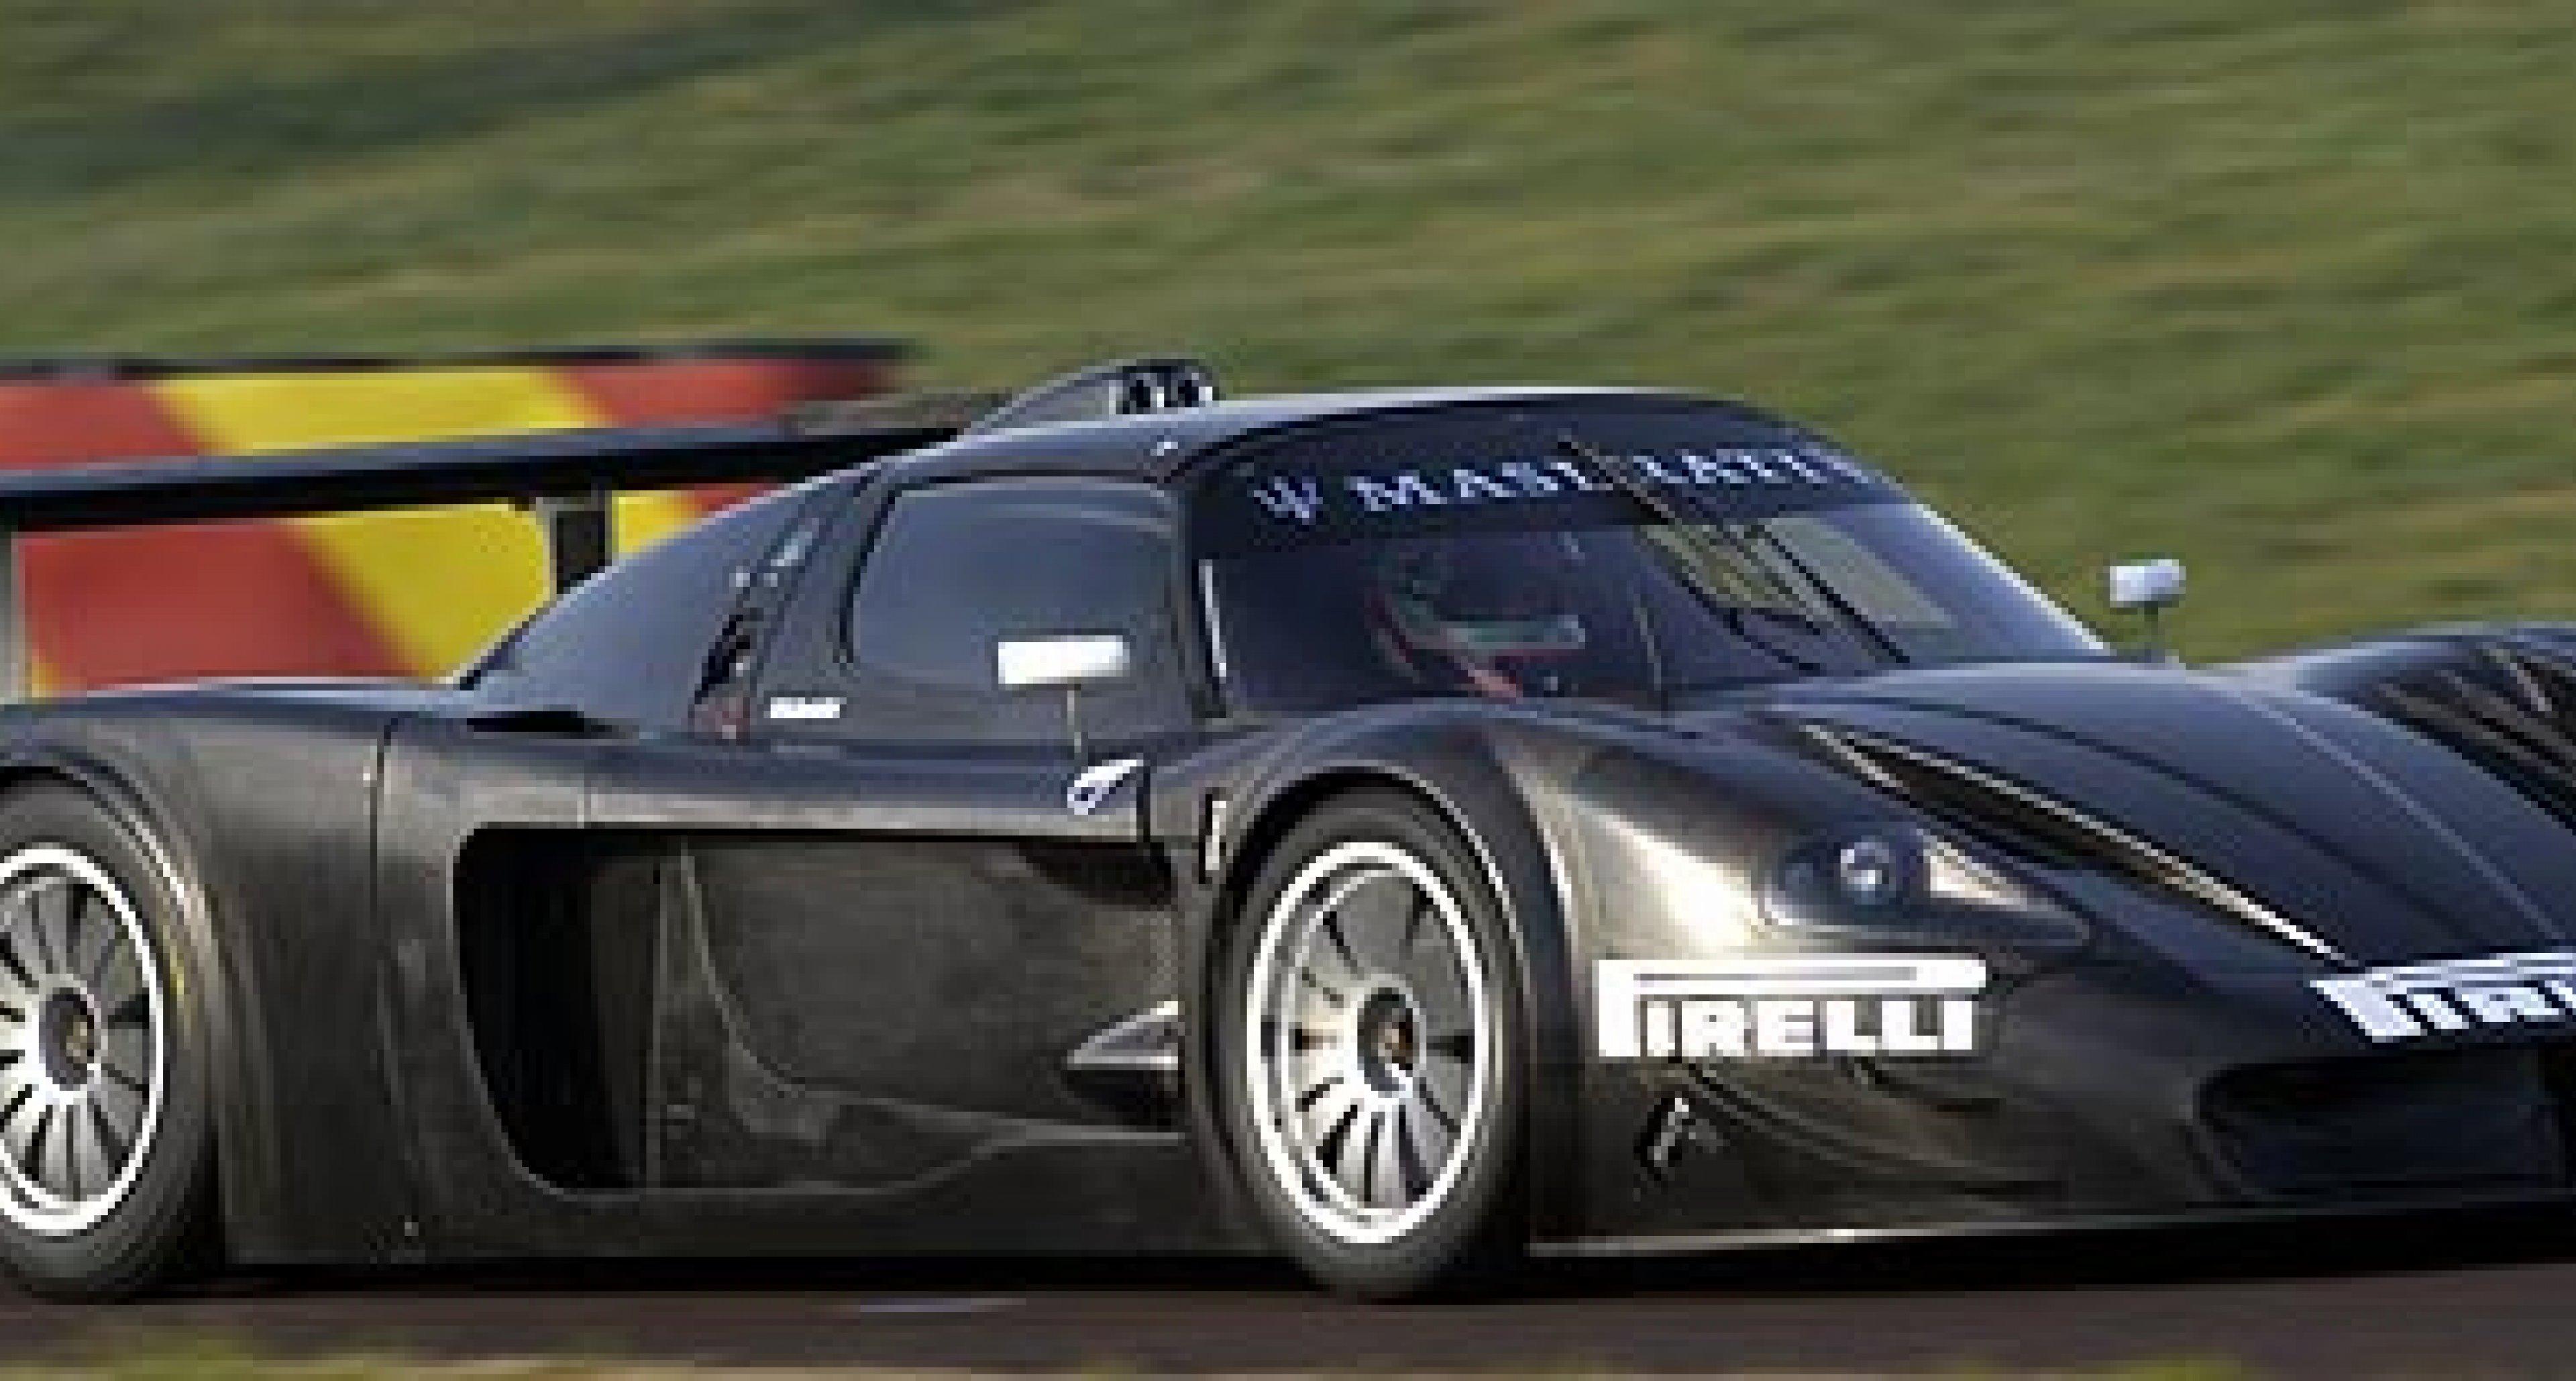 New Maserati FIA GT car - the MCC - revealed